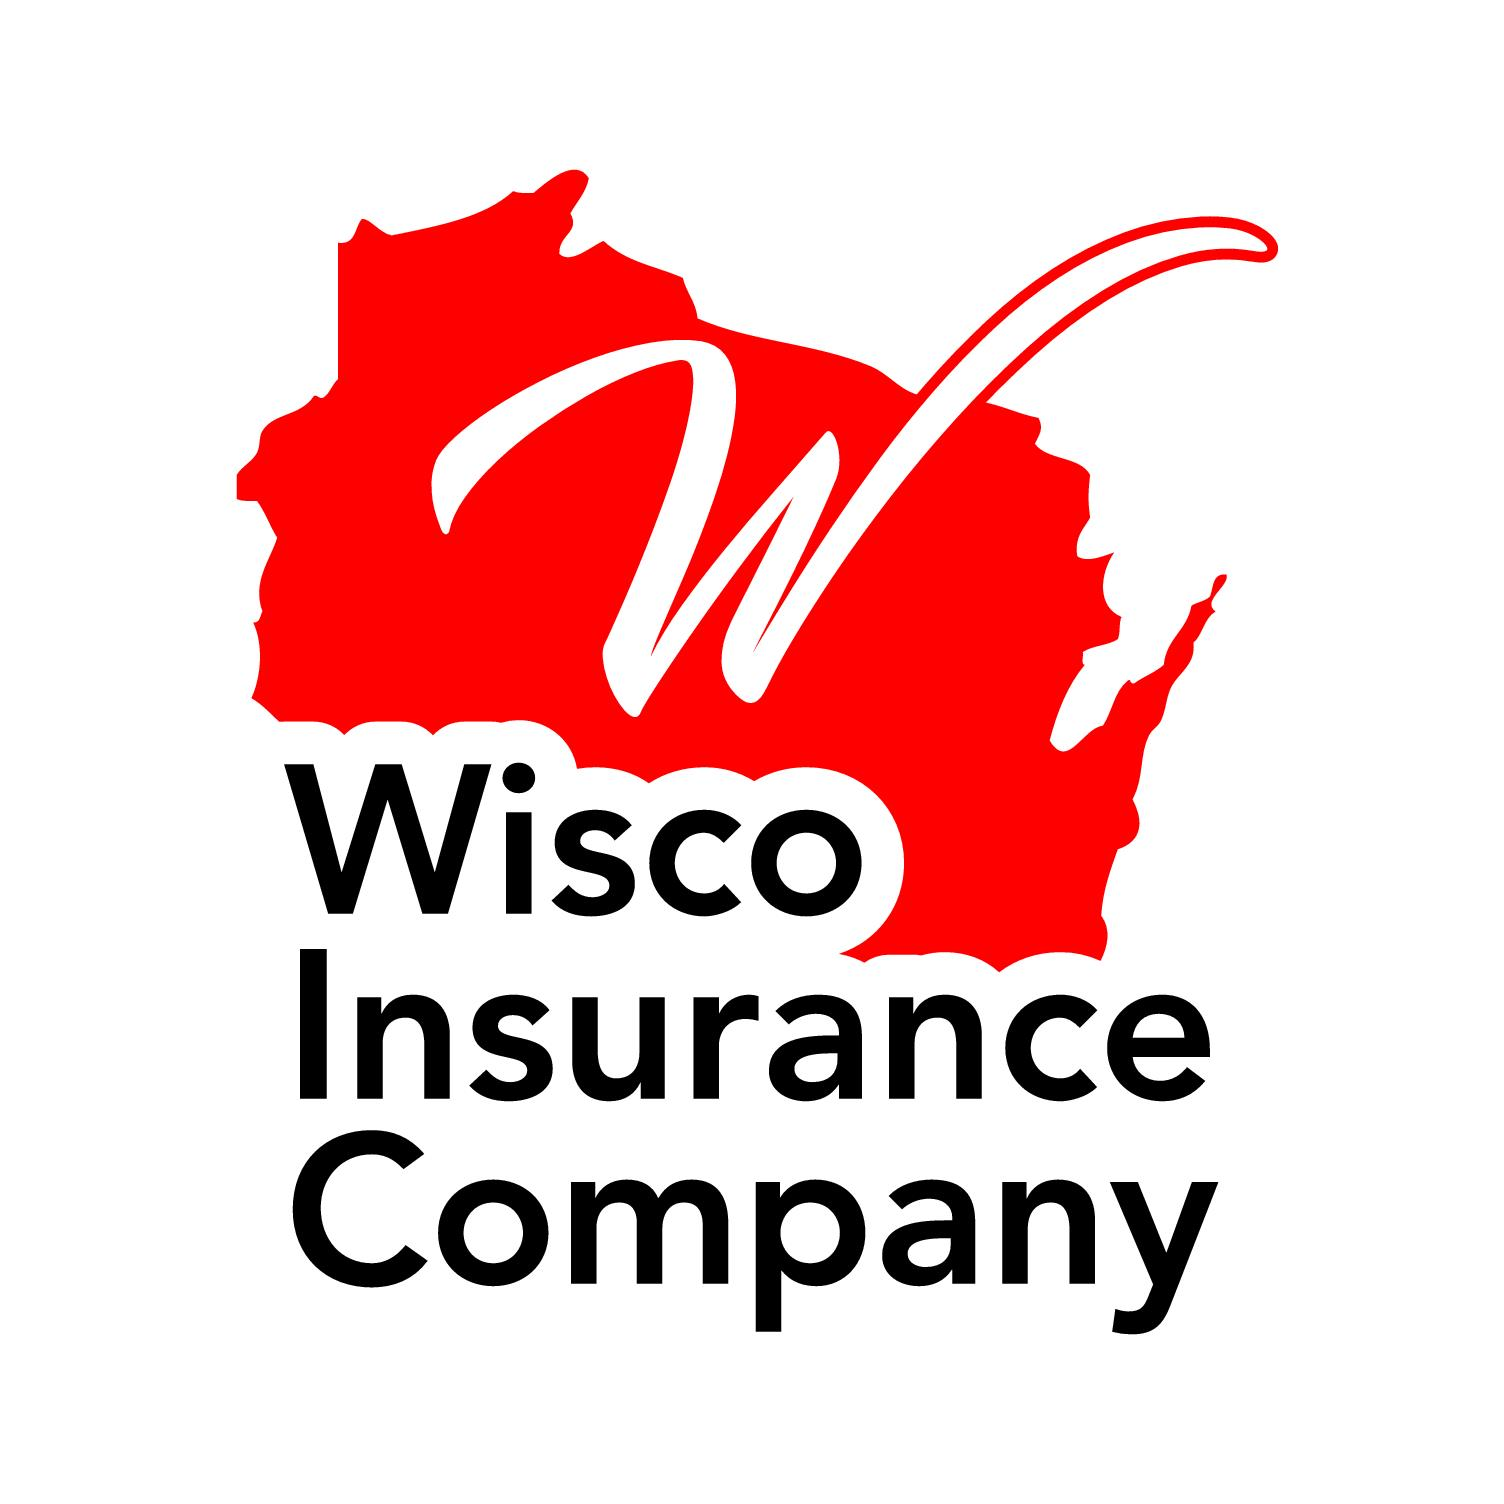 Wisco Insurance Company 2833 Milton Ave Janesville Wi